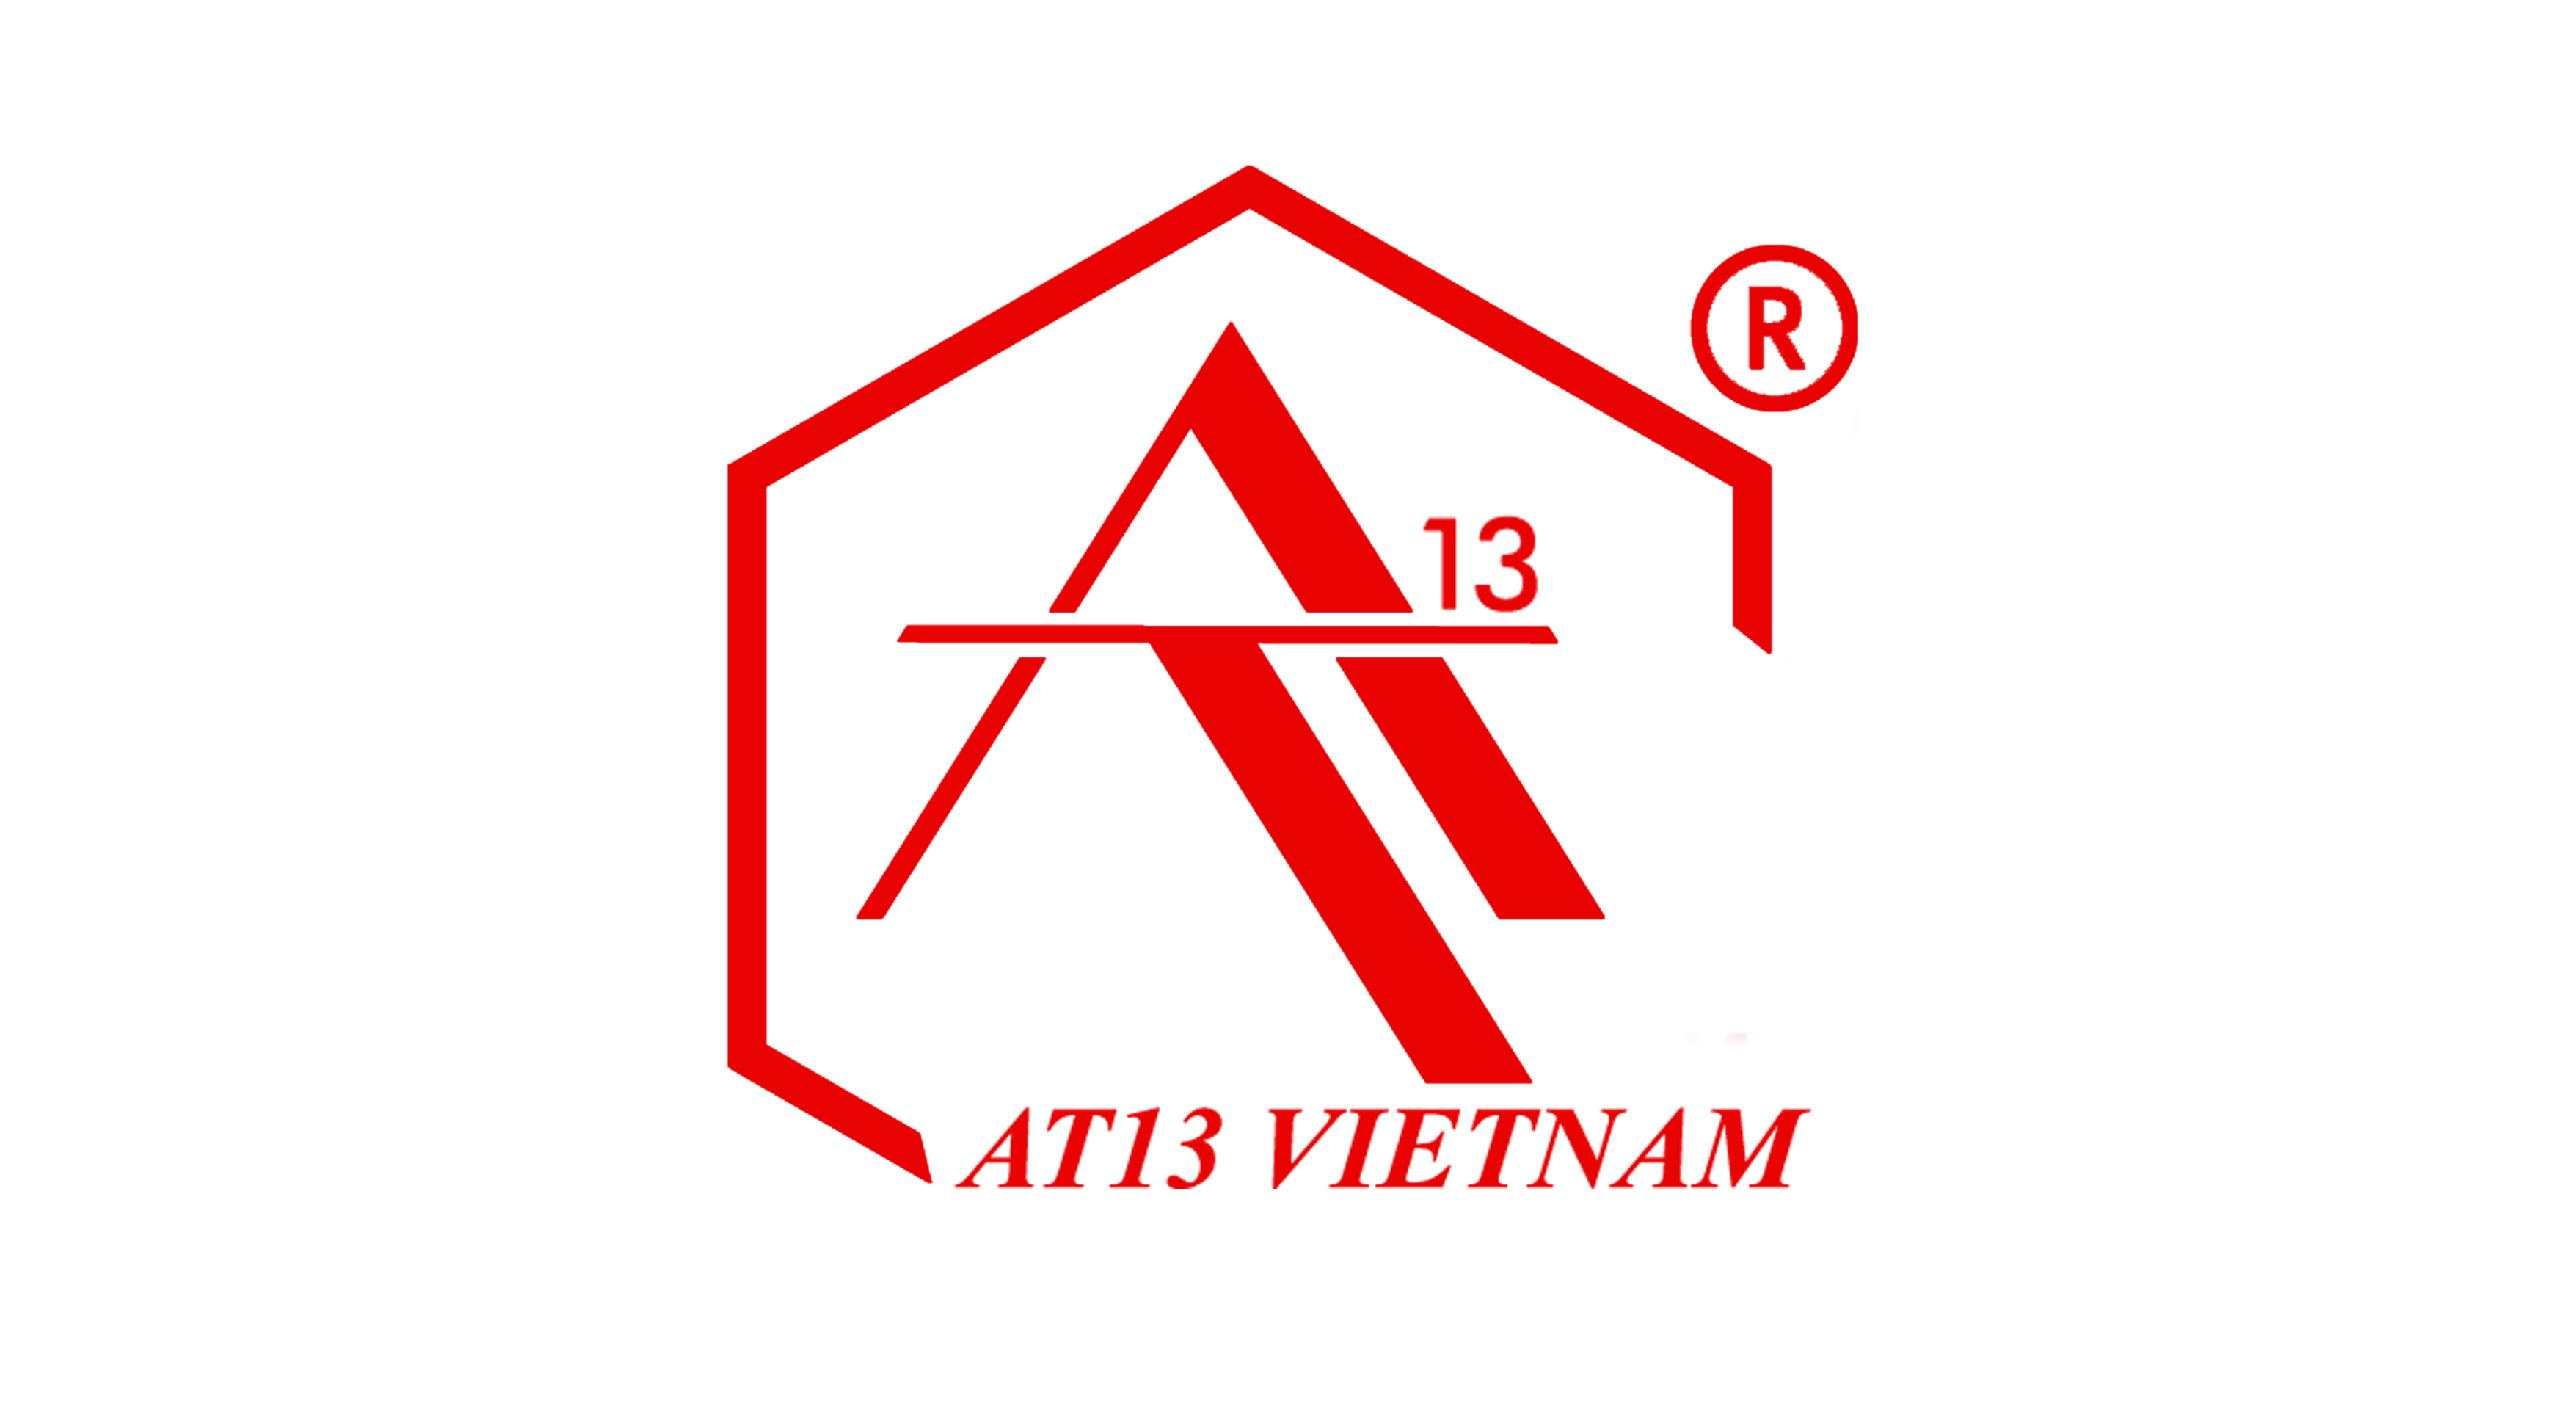 cong-ty-tnhh-san-xuat-thuong-mai-dich-vu-at13